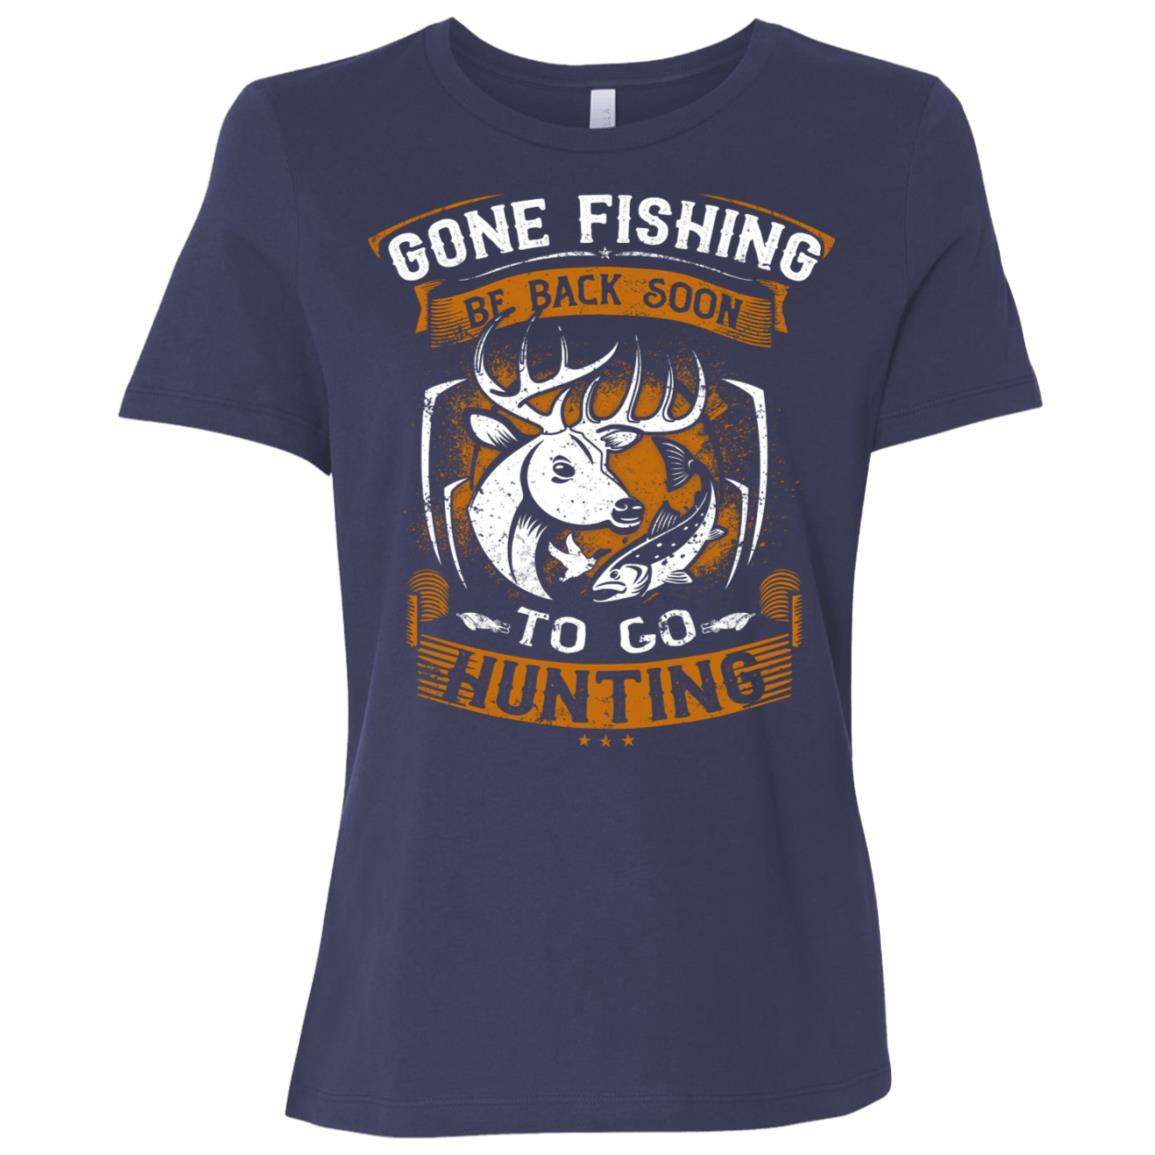 Funny Fishing Hunting Gift for Hunters-1 Women Short Sleeve T-Shirt